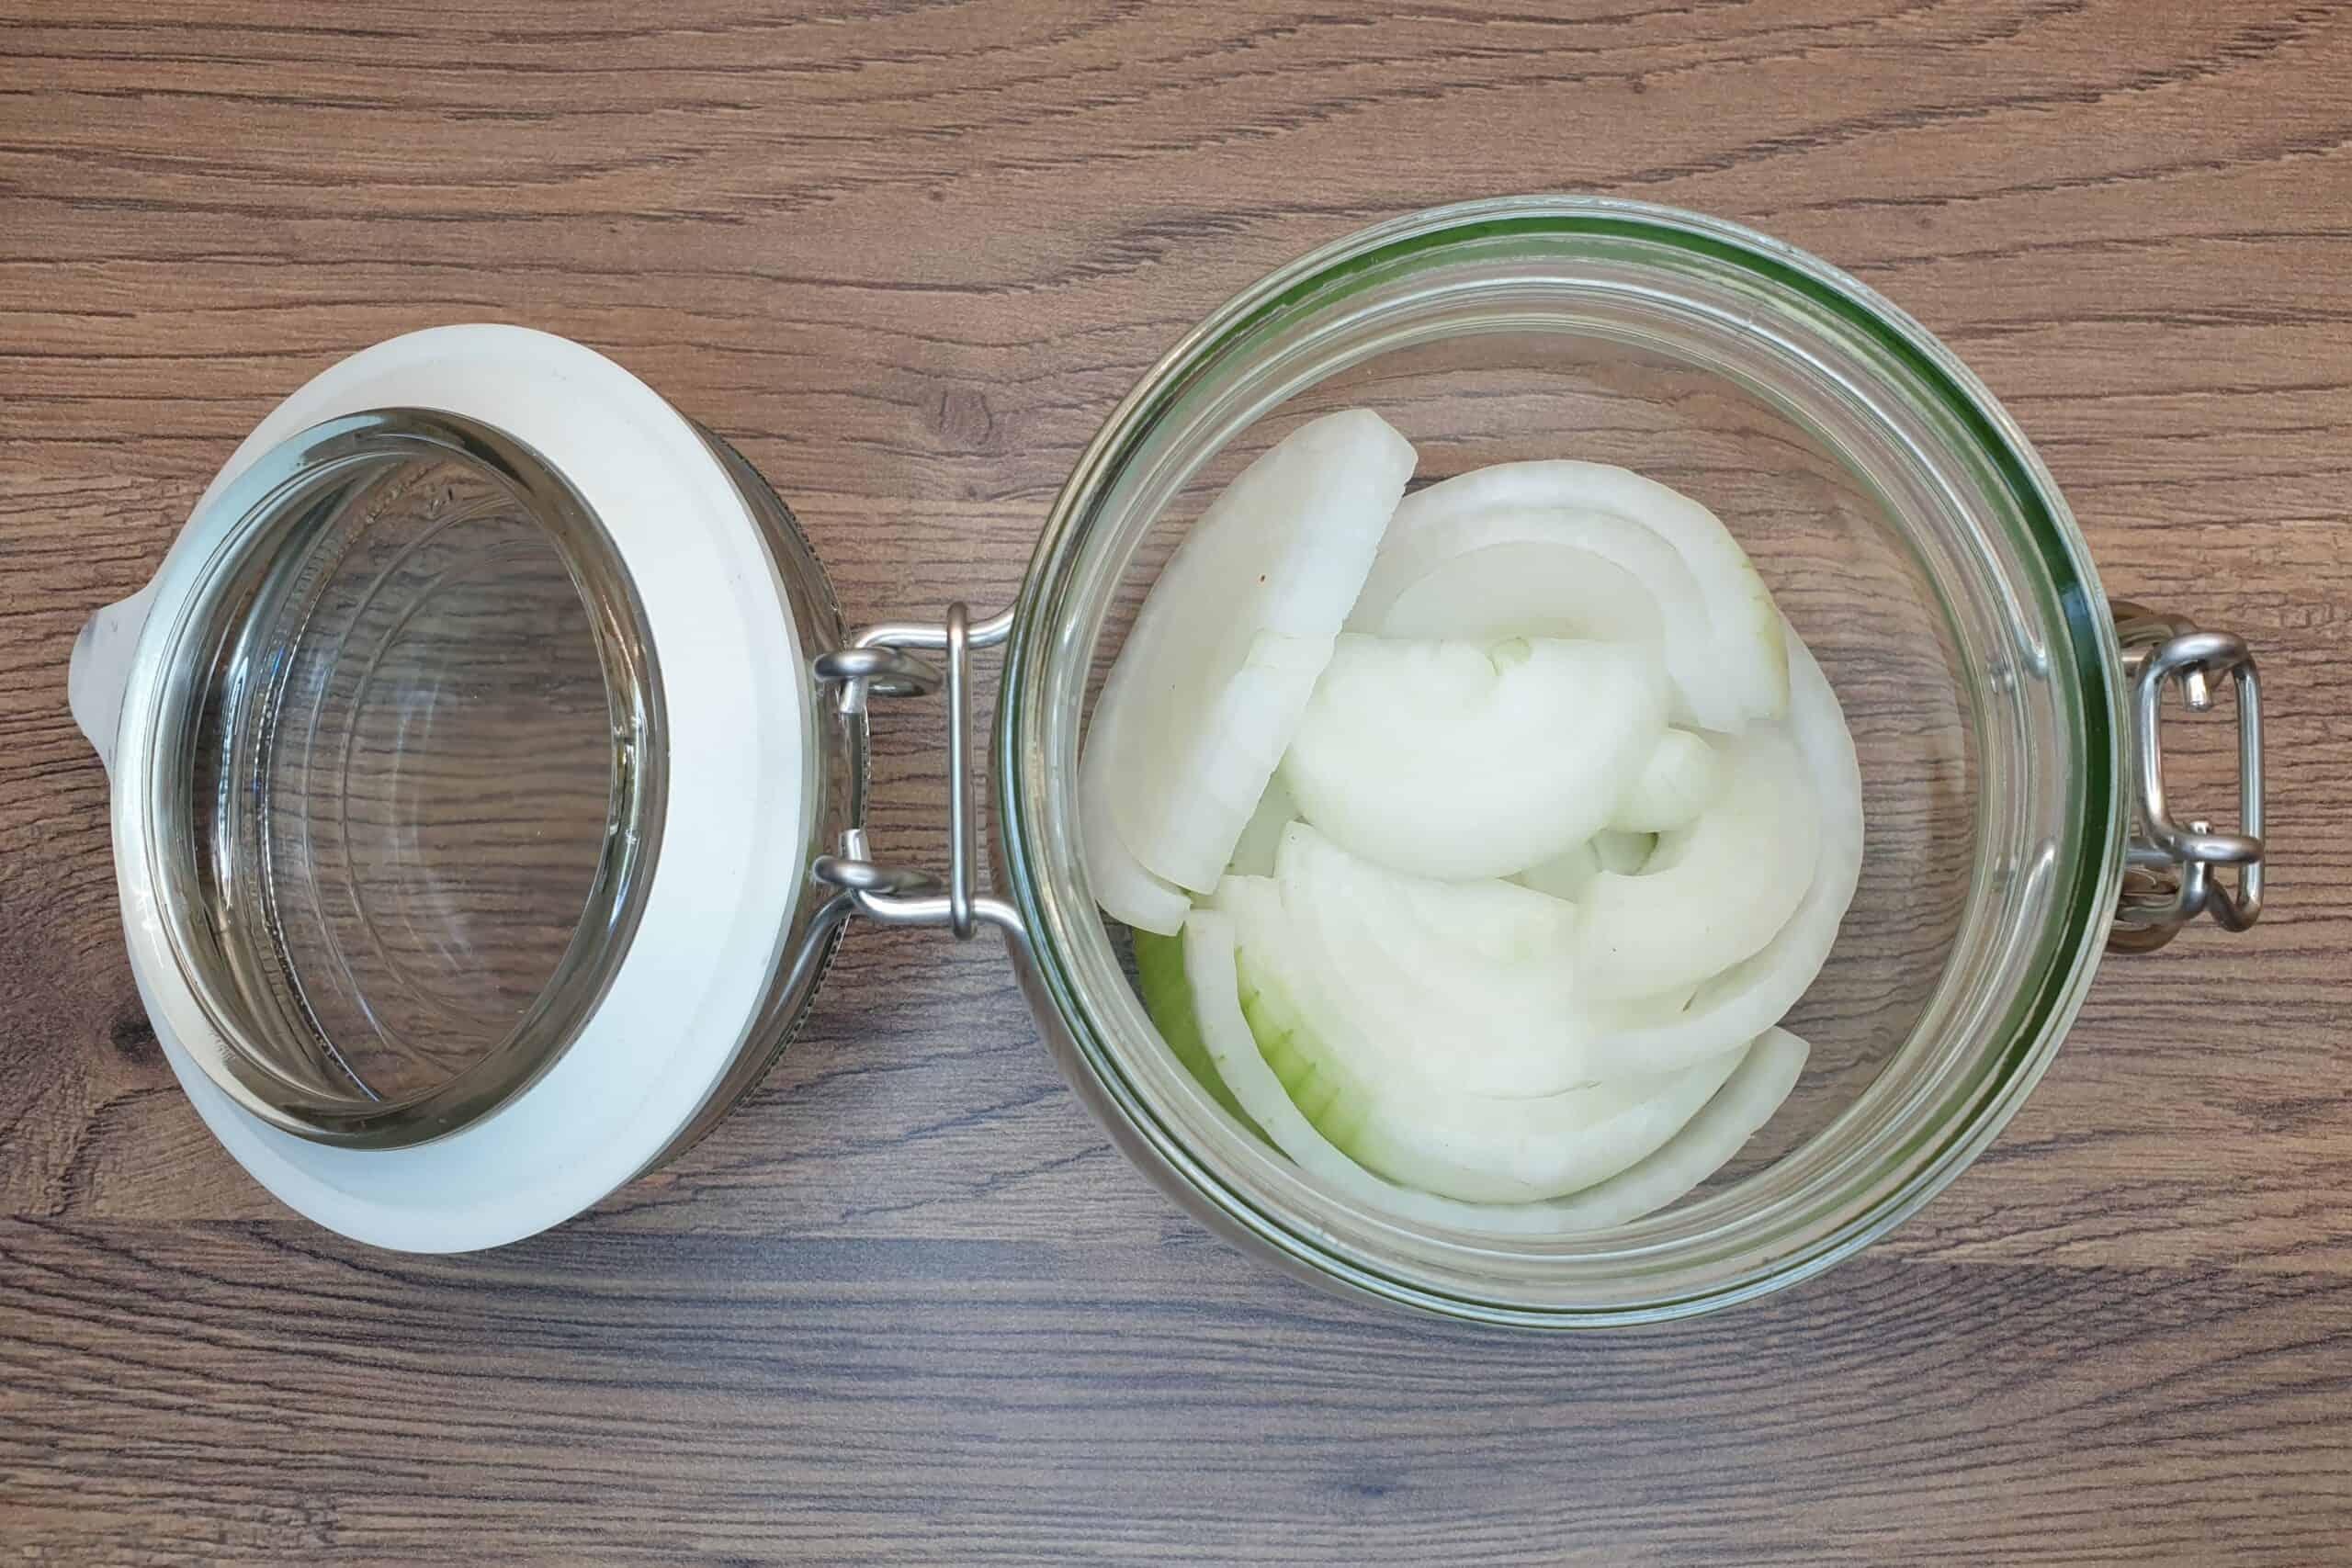 2. warstwa cebuli, syrop zcebuli, Matka Aptekarka